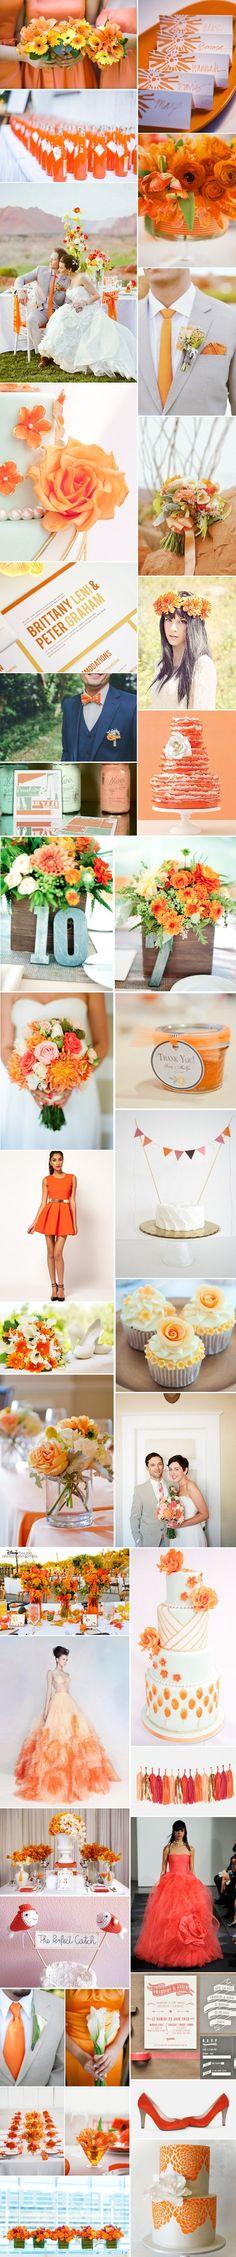 [Inspiration] Mariage orange                                                                                                                                                     Plus